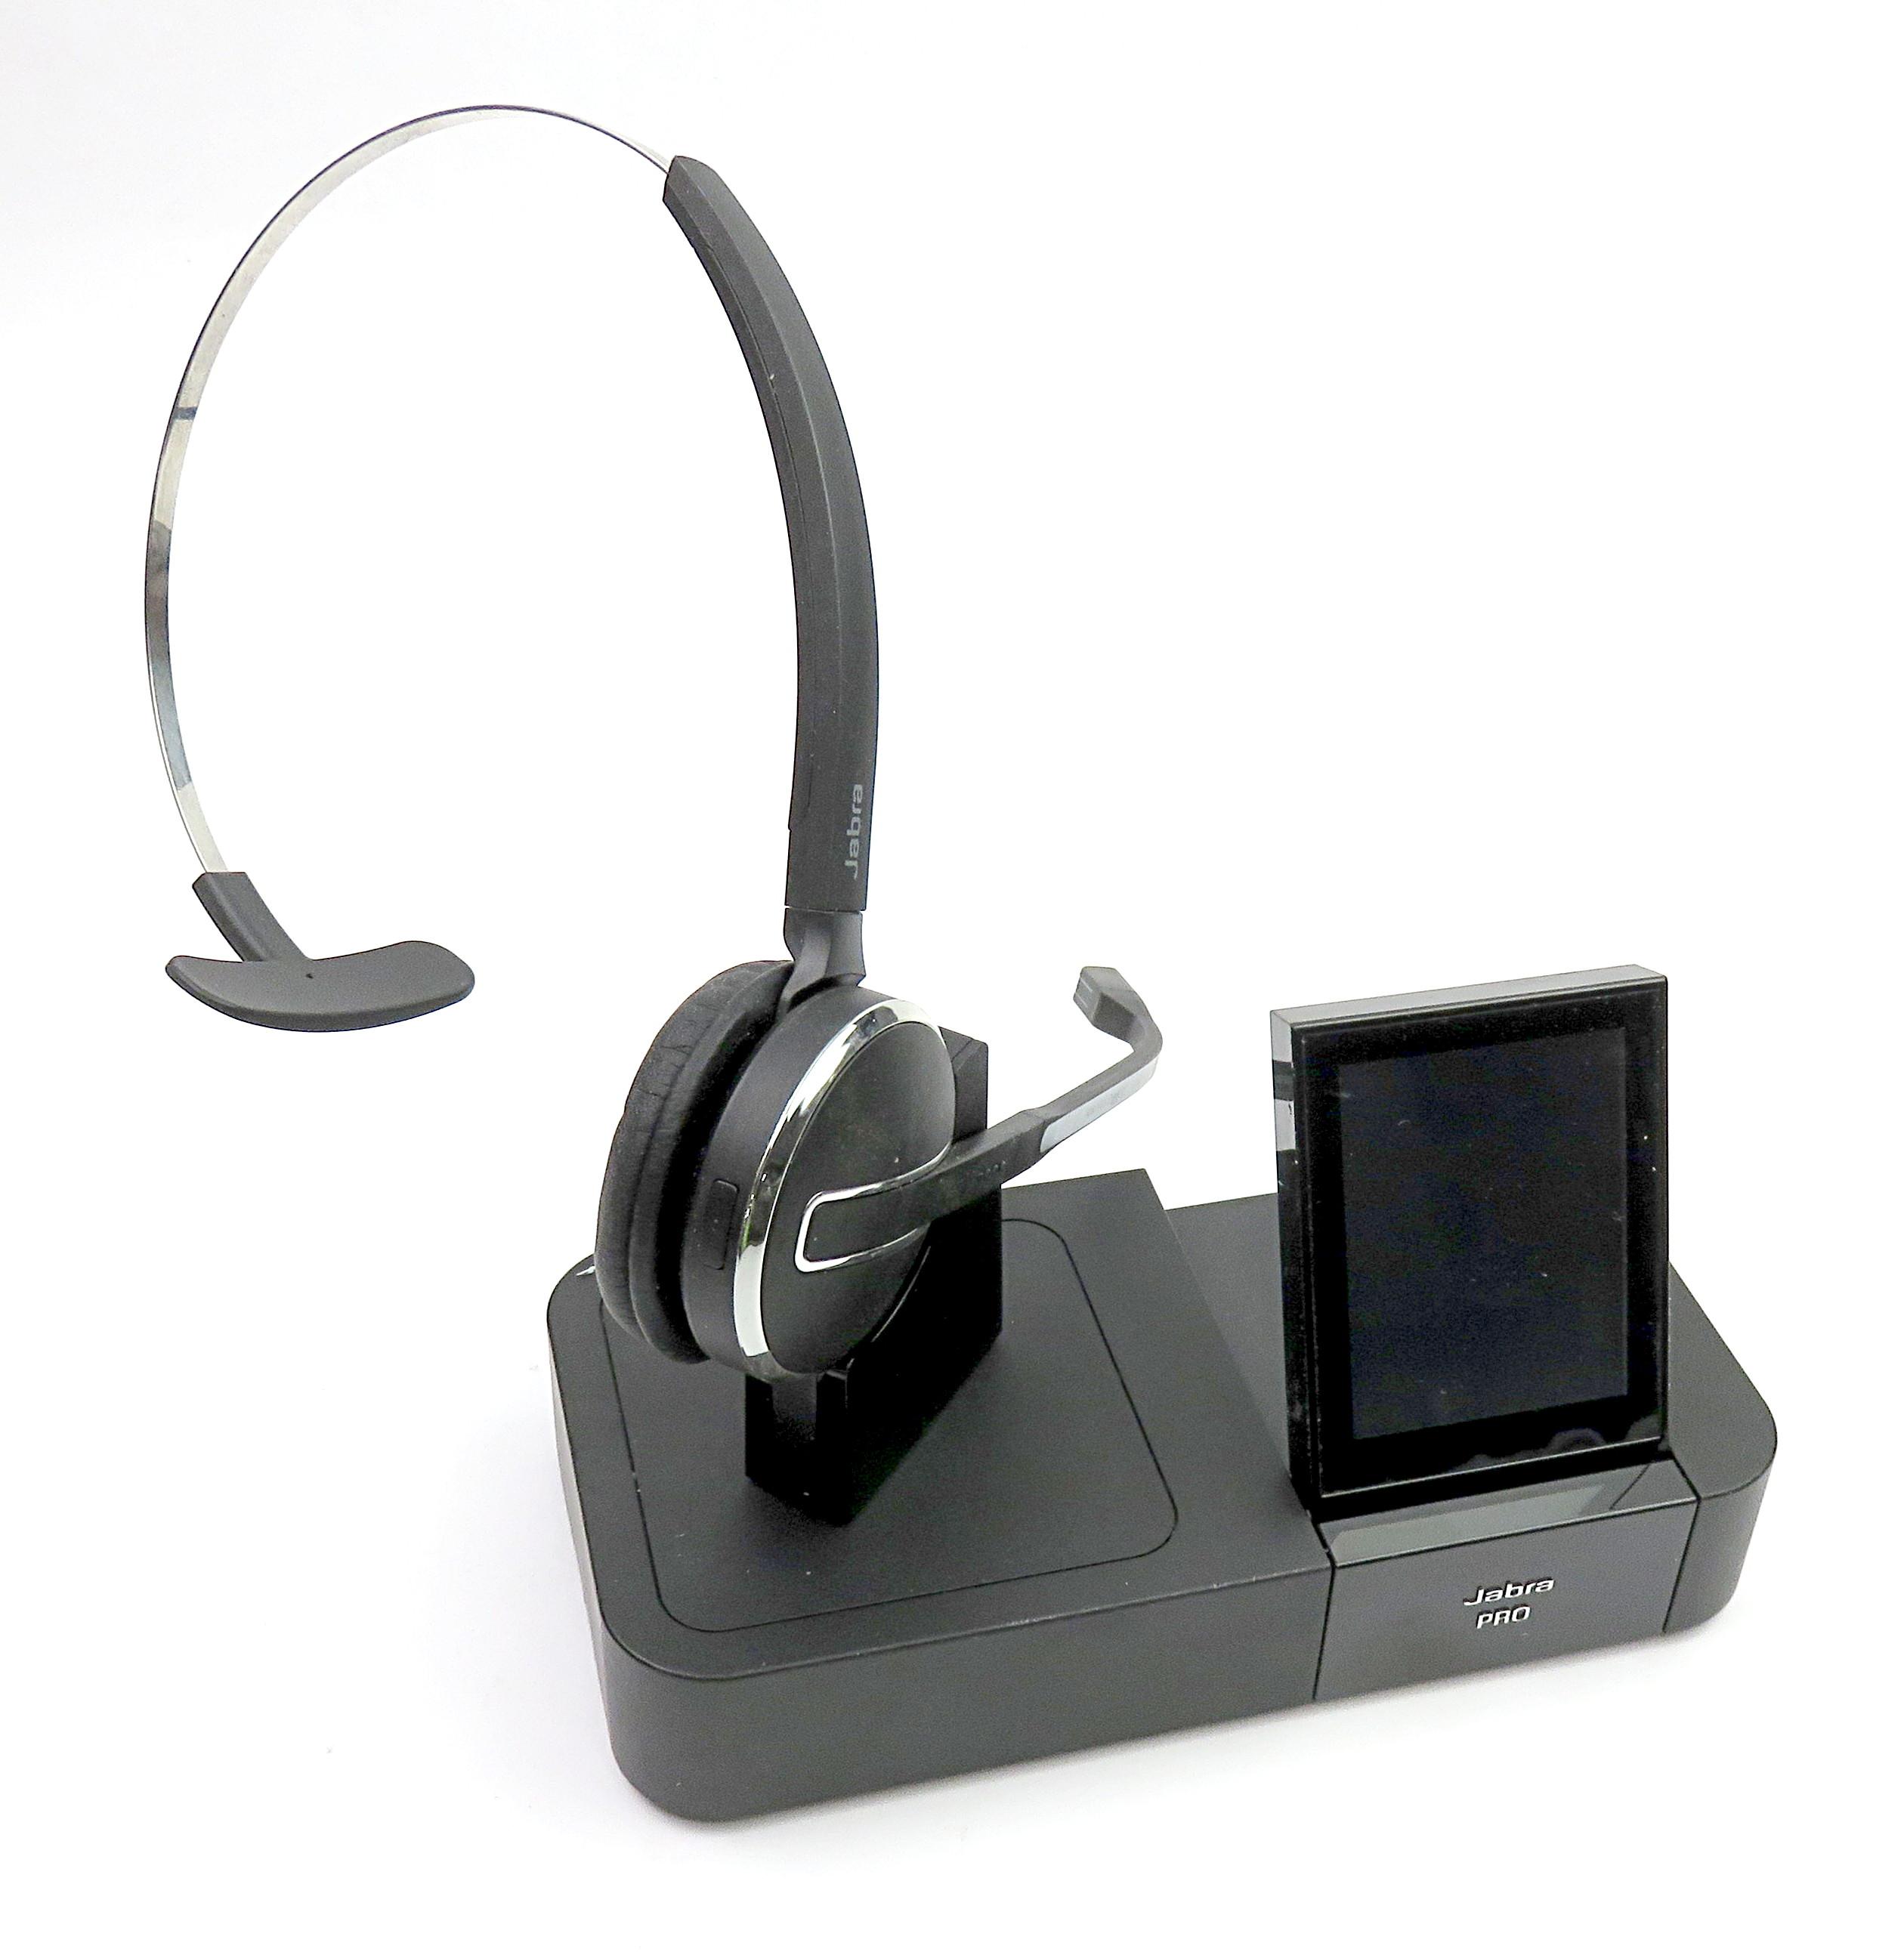 Jabra PRO 9460 Monaural DECT Wireless Telephony System